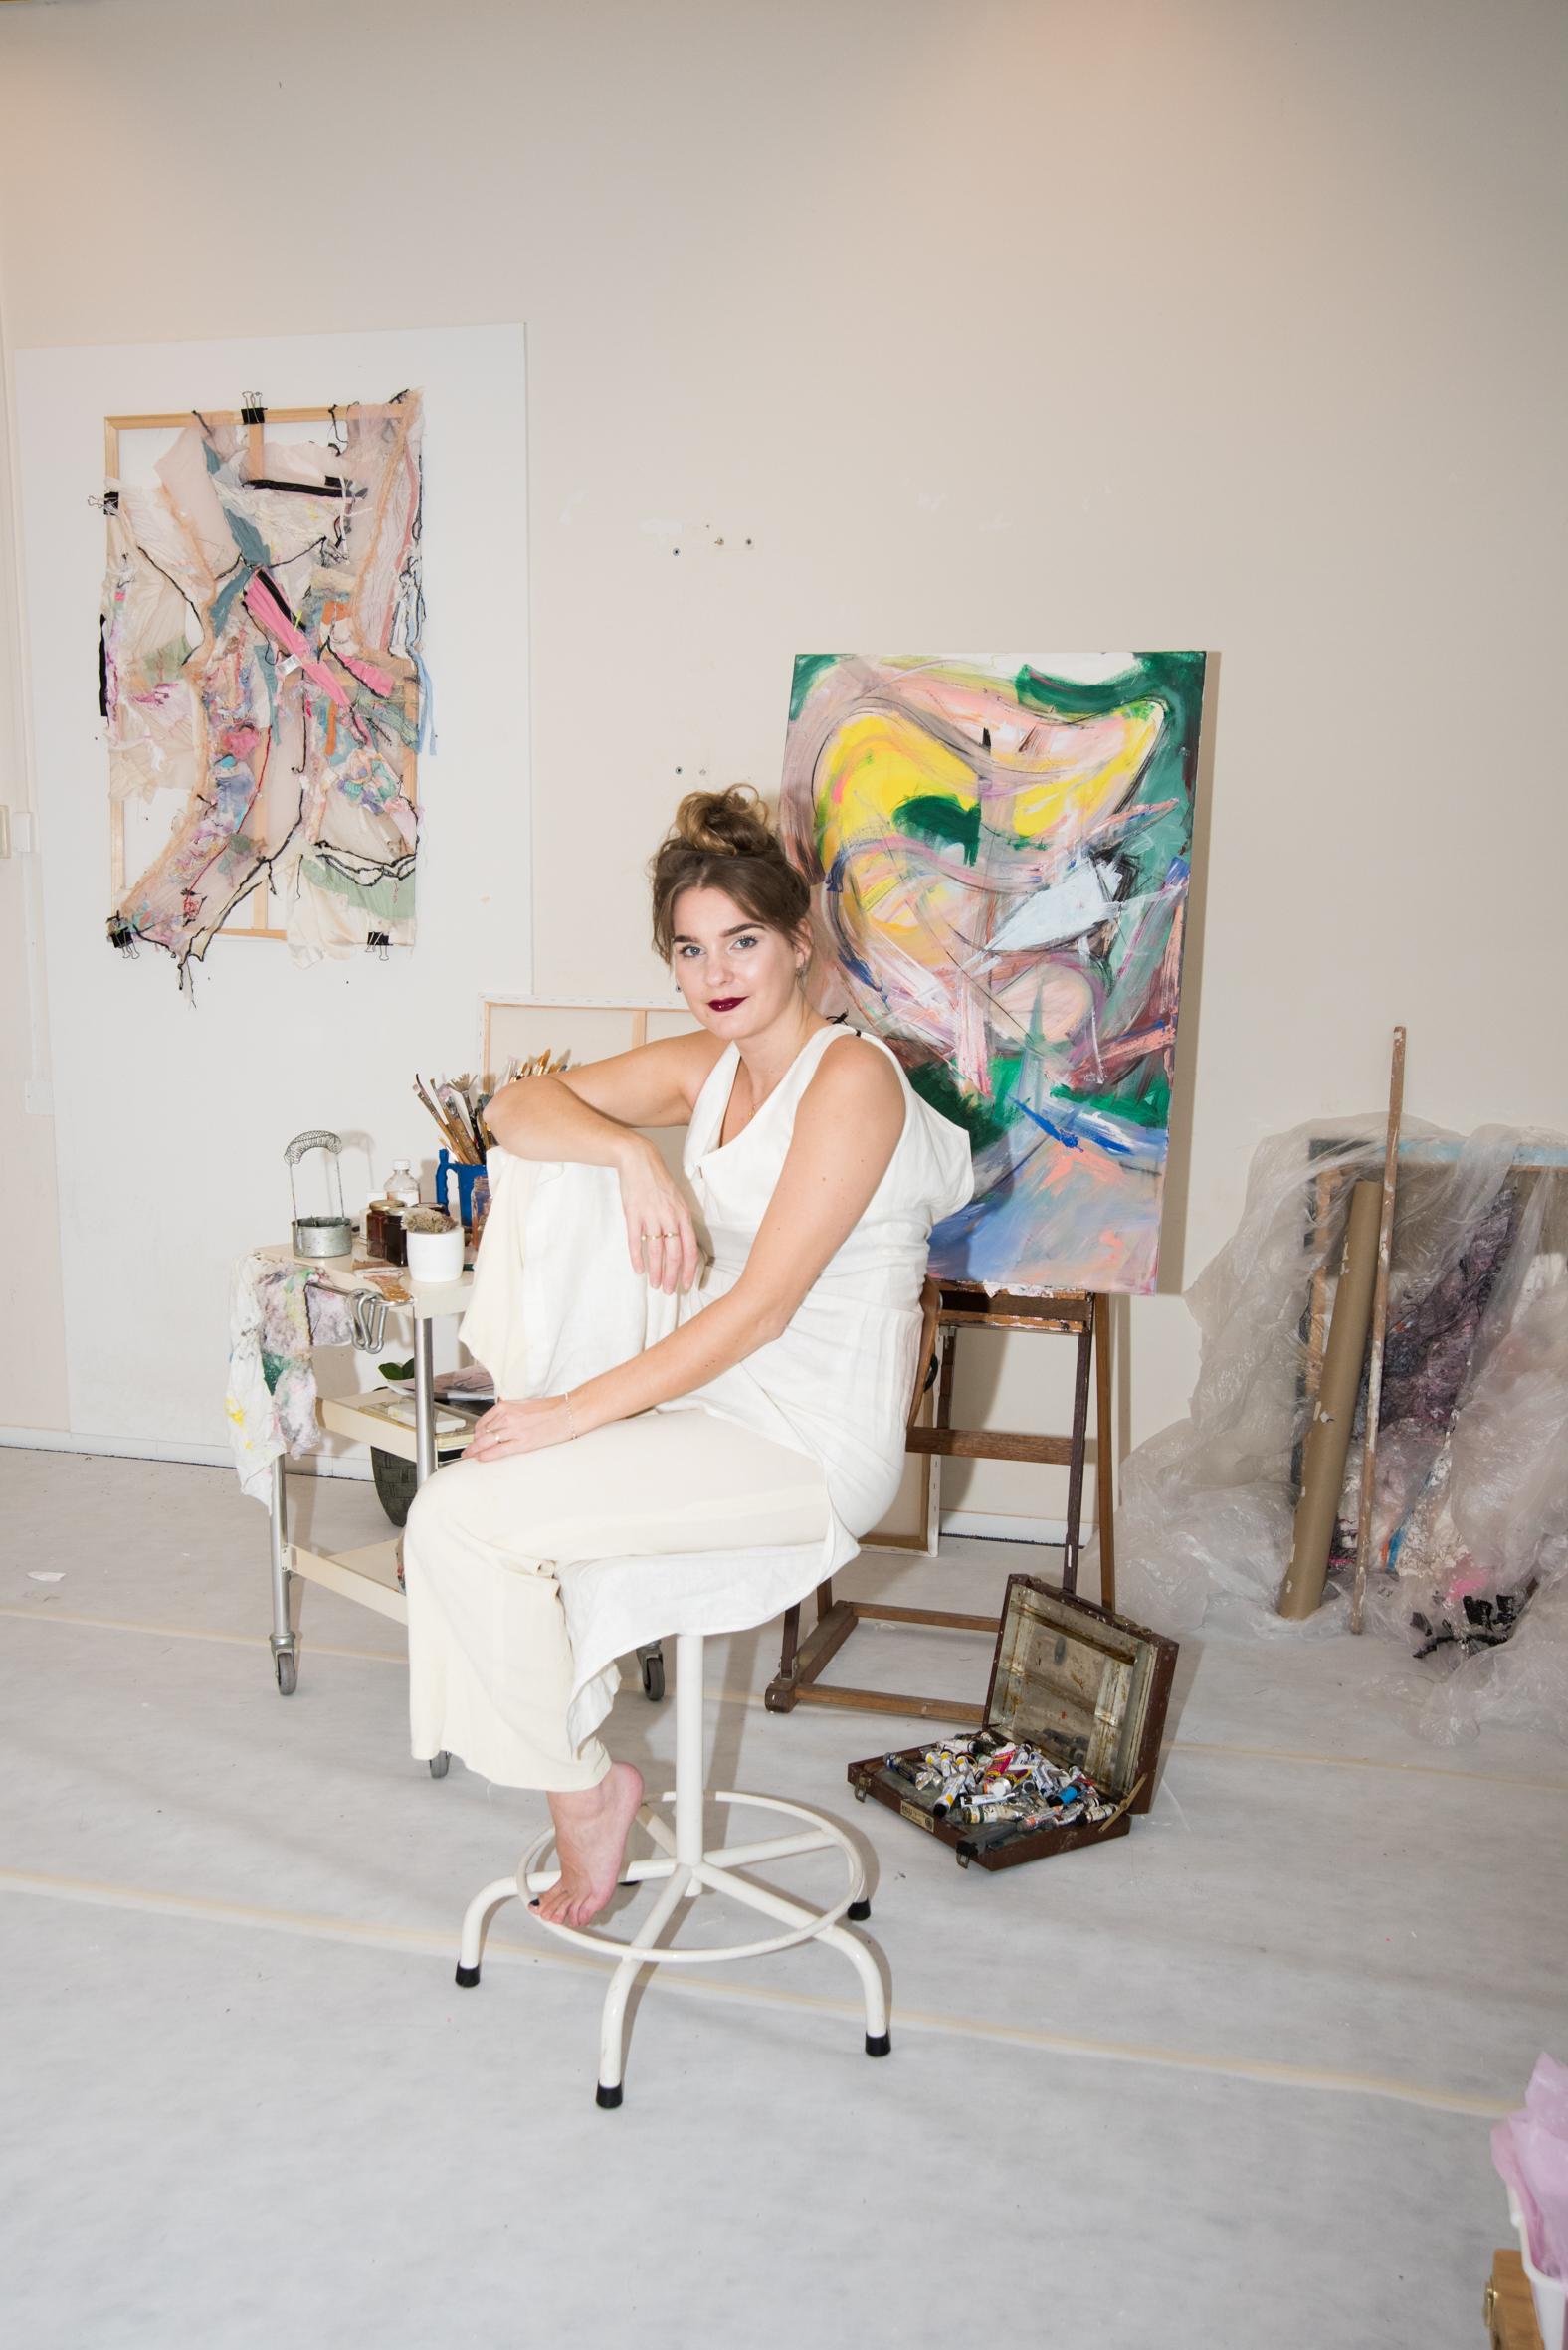 Lynn Kate Rosdorff